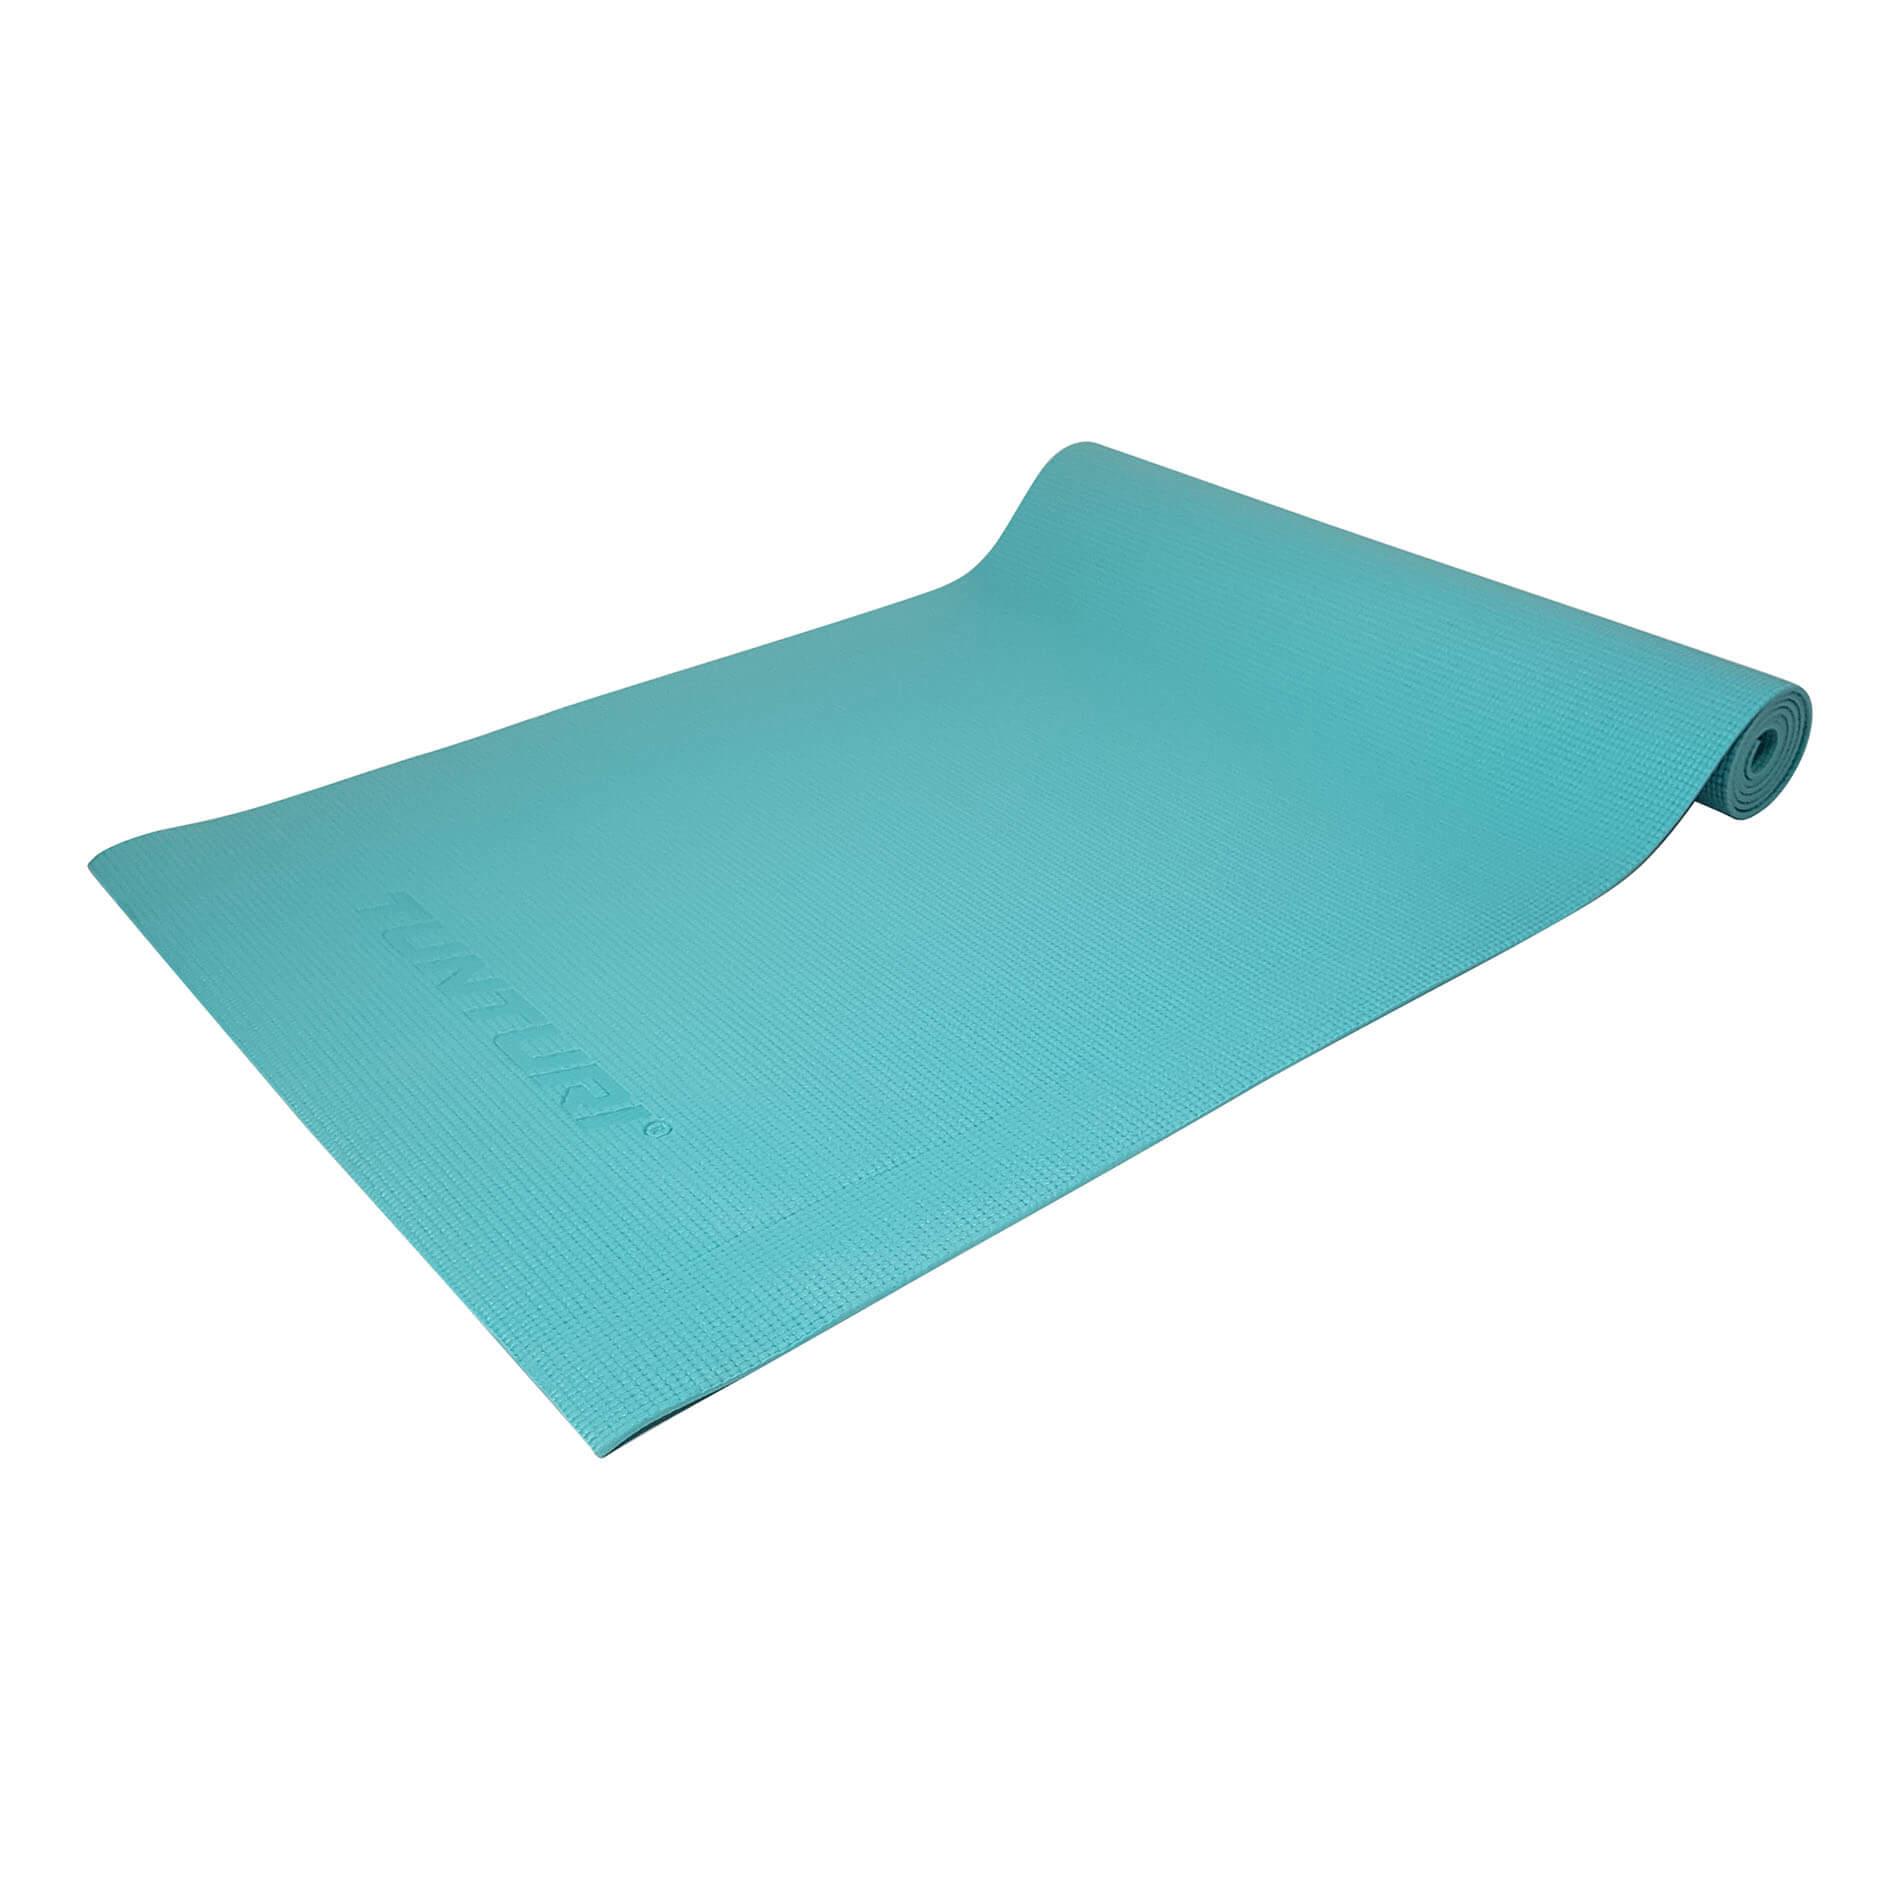 PVC Yogamat 4mm